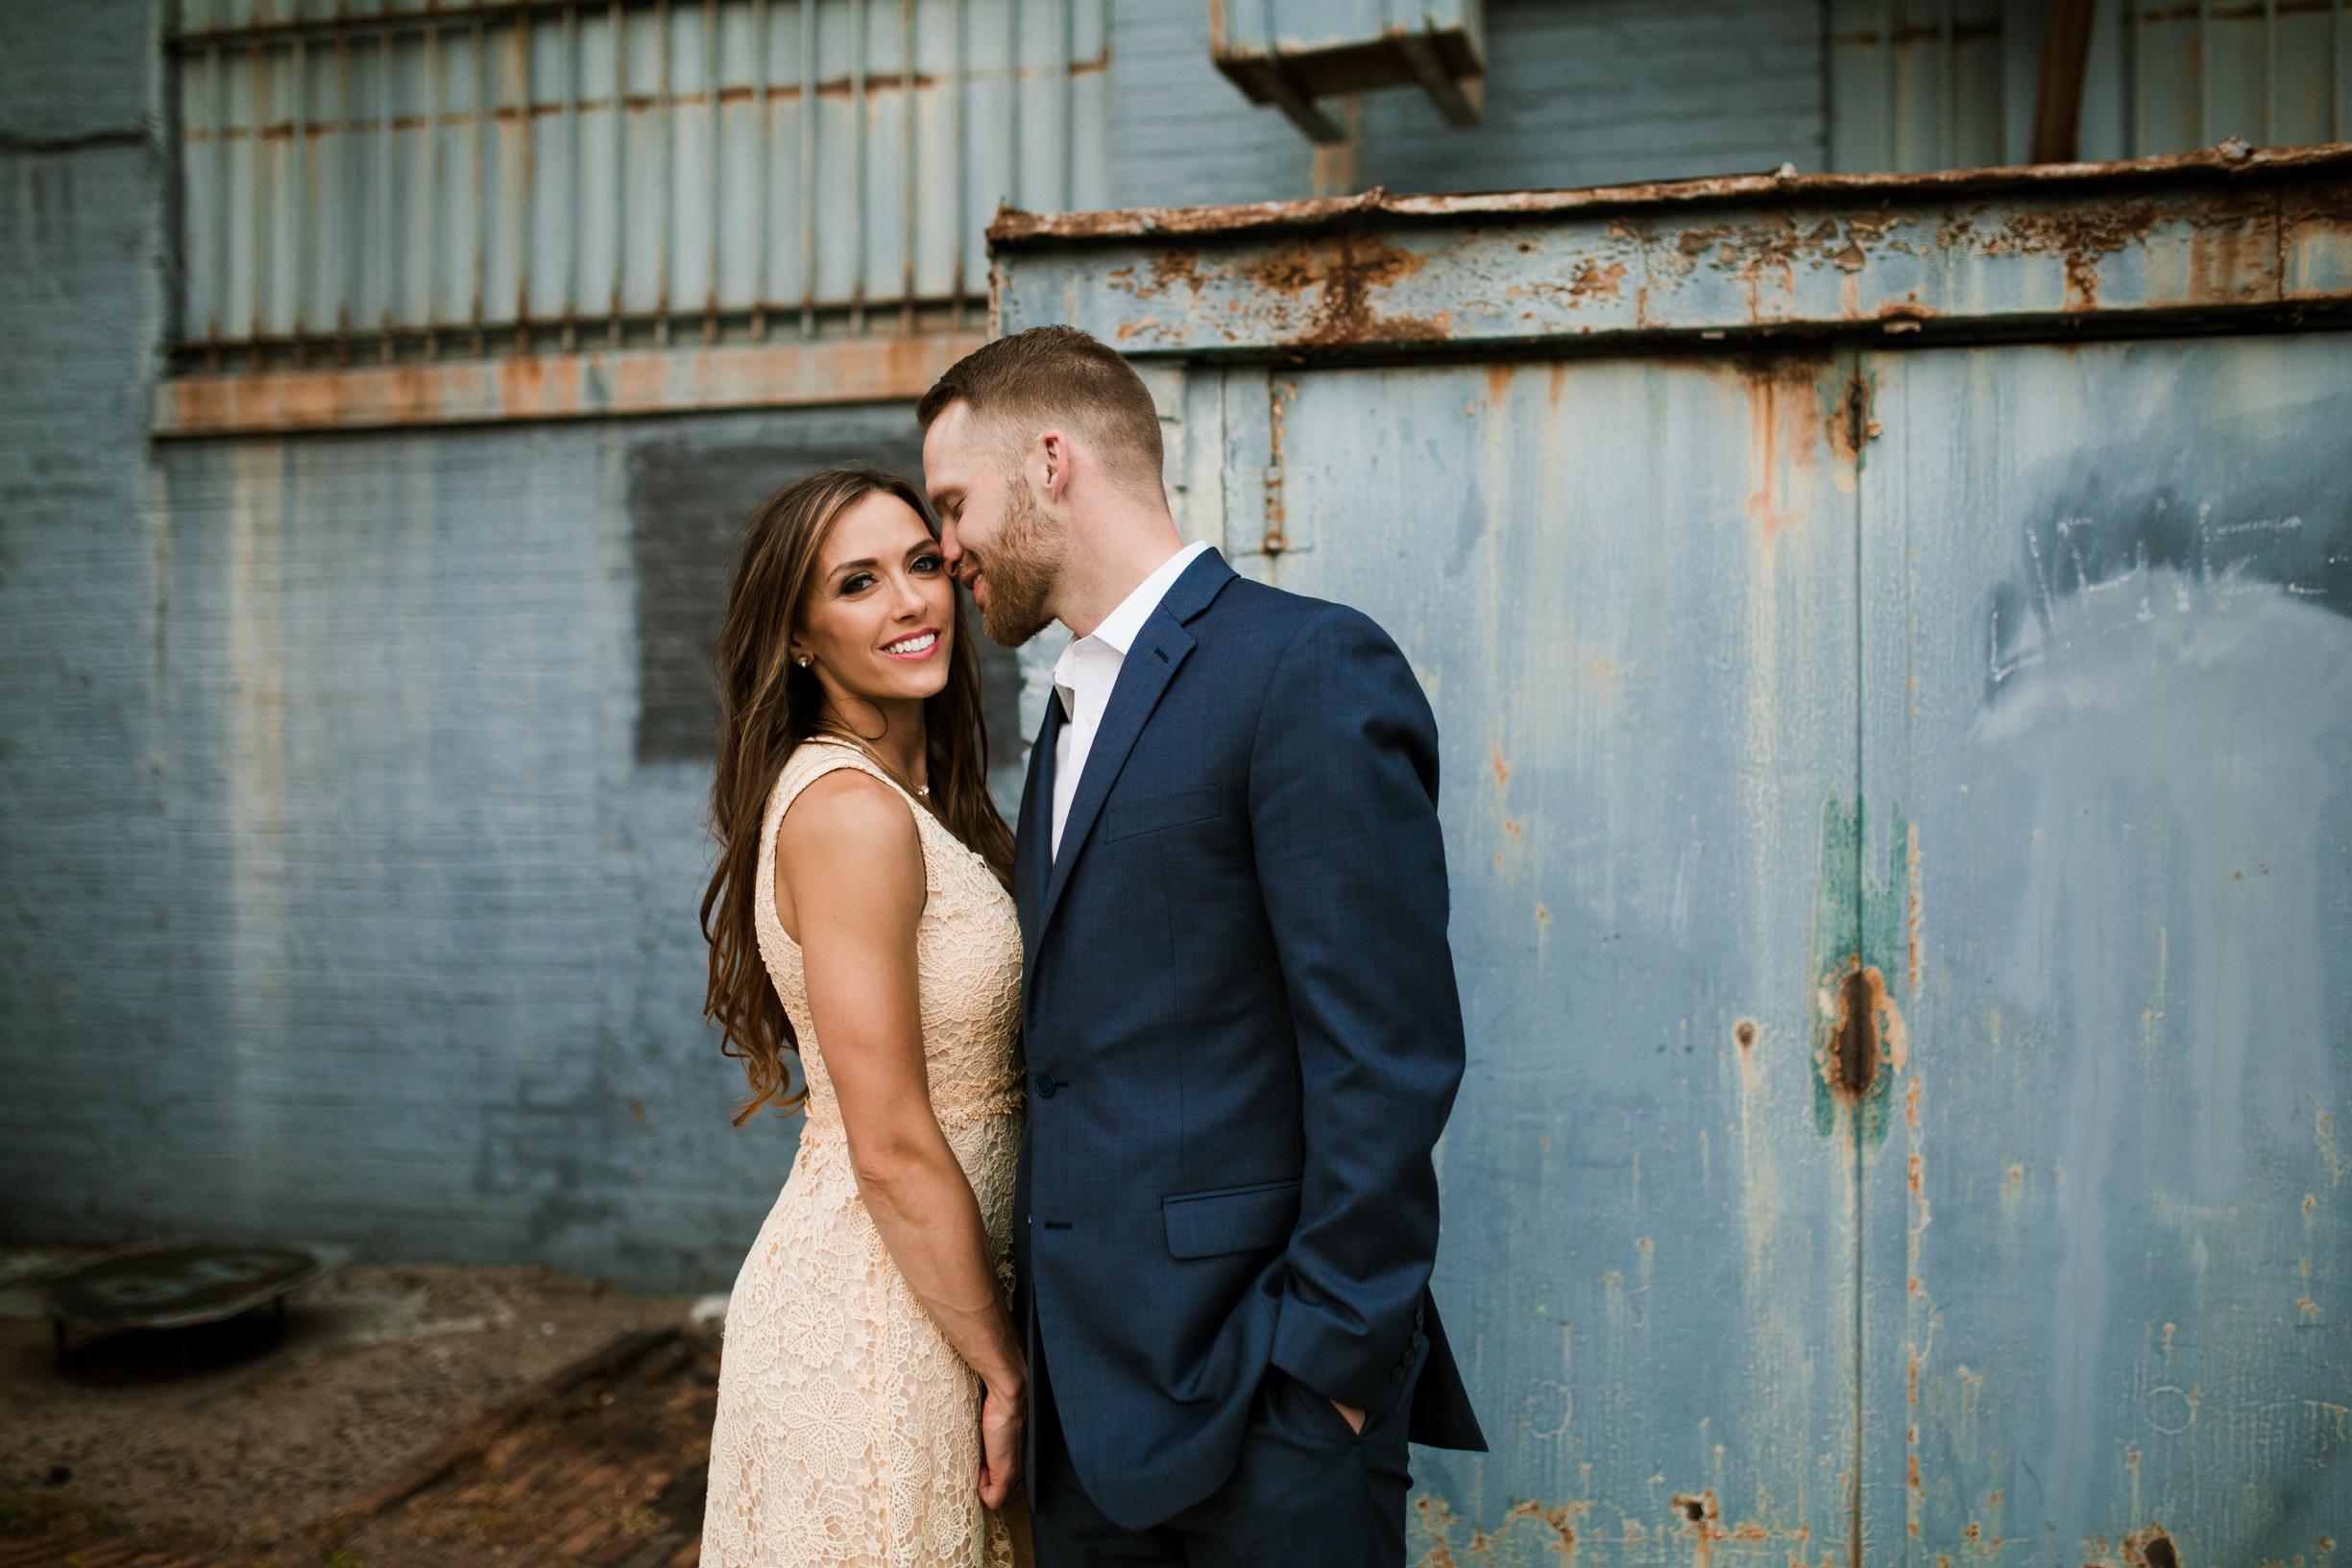 Victoria & Chad Engagement 2018 Crystal Ludwick Photo Louisville Kentucky Wedding Photographer WEBSITE (16 of 48).jpg